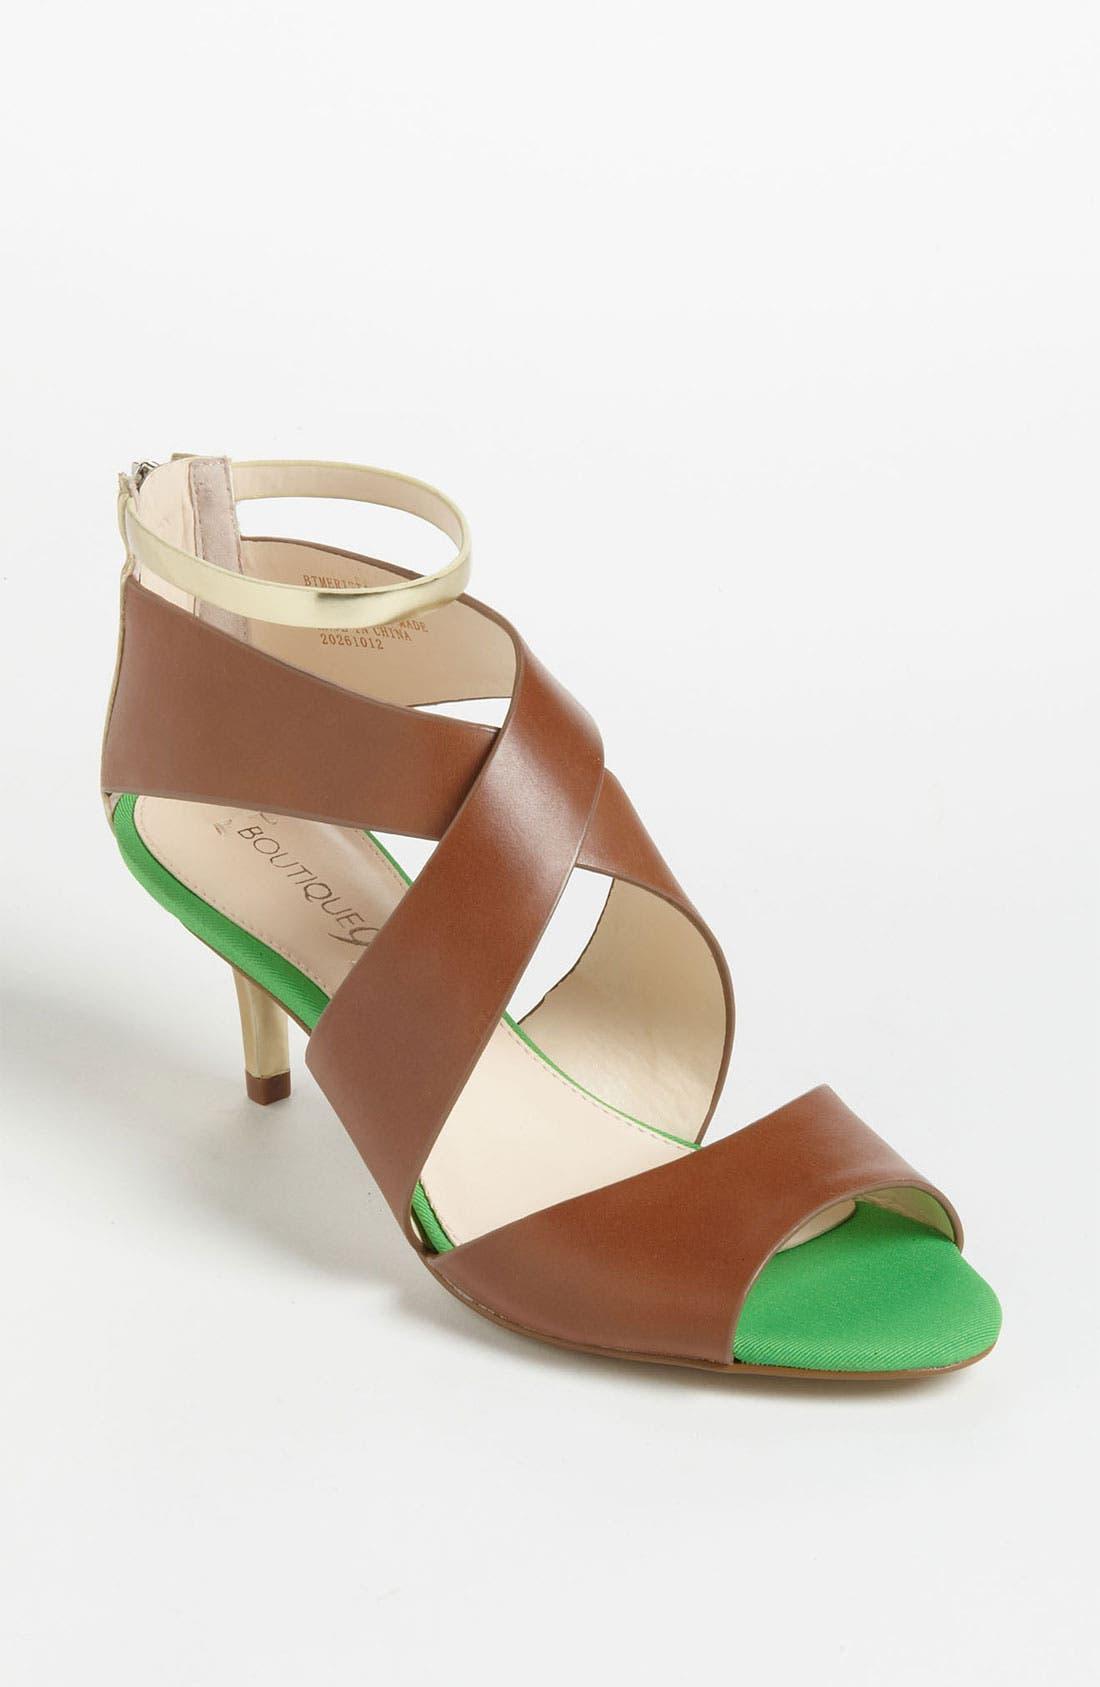 Main Image - Boutique 9 'Merista' Sandal